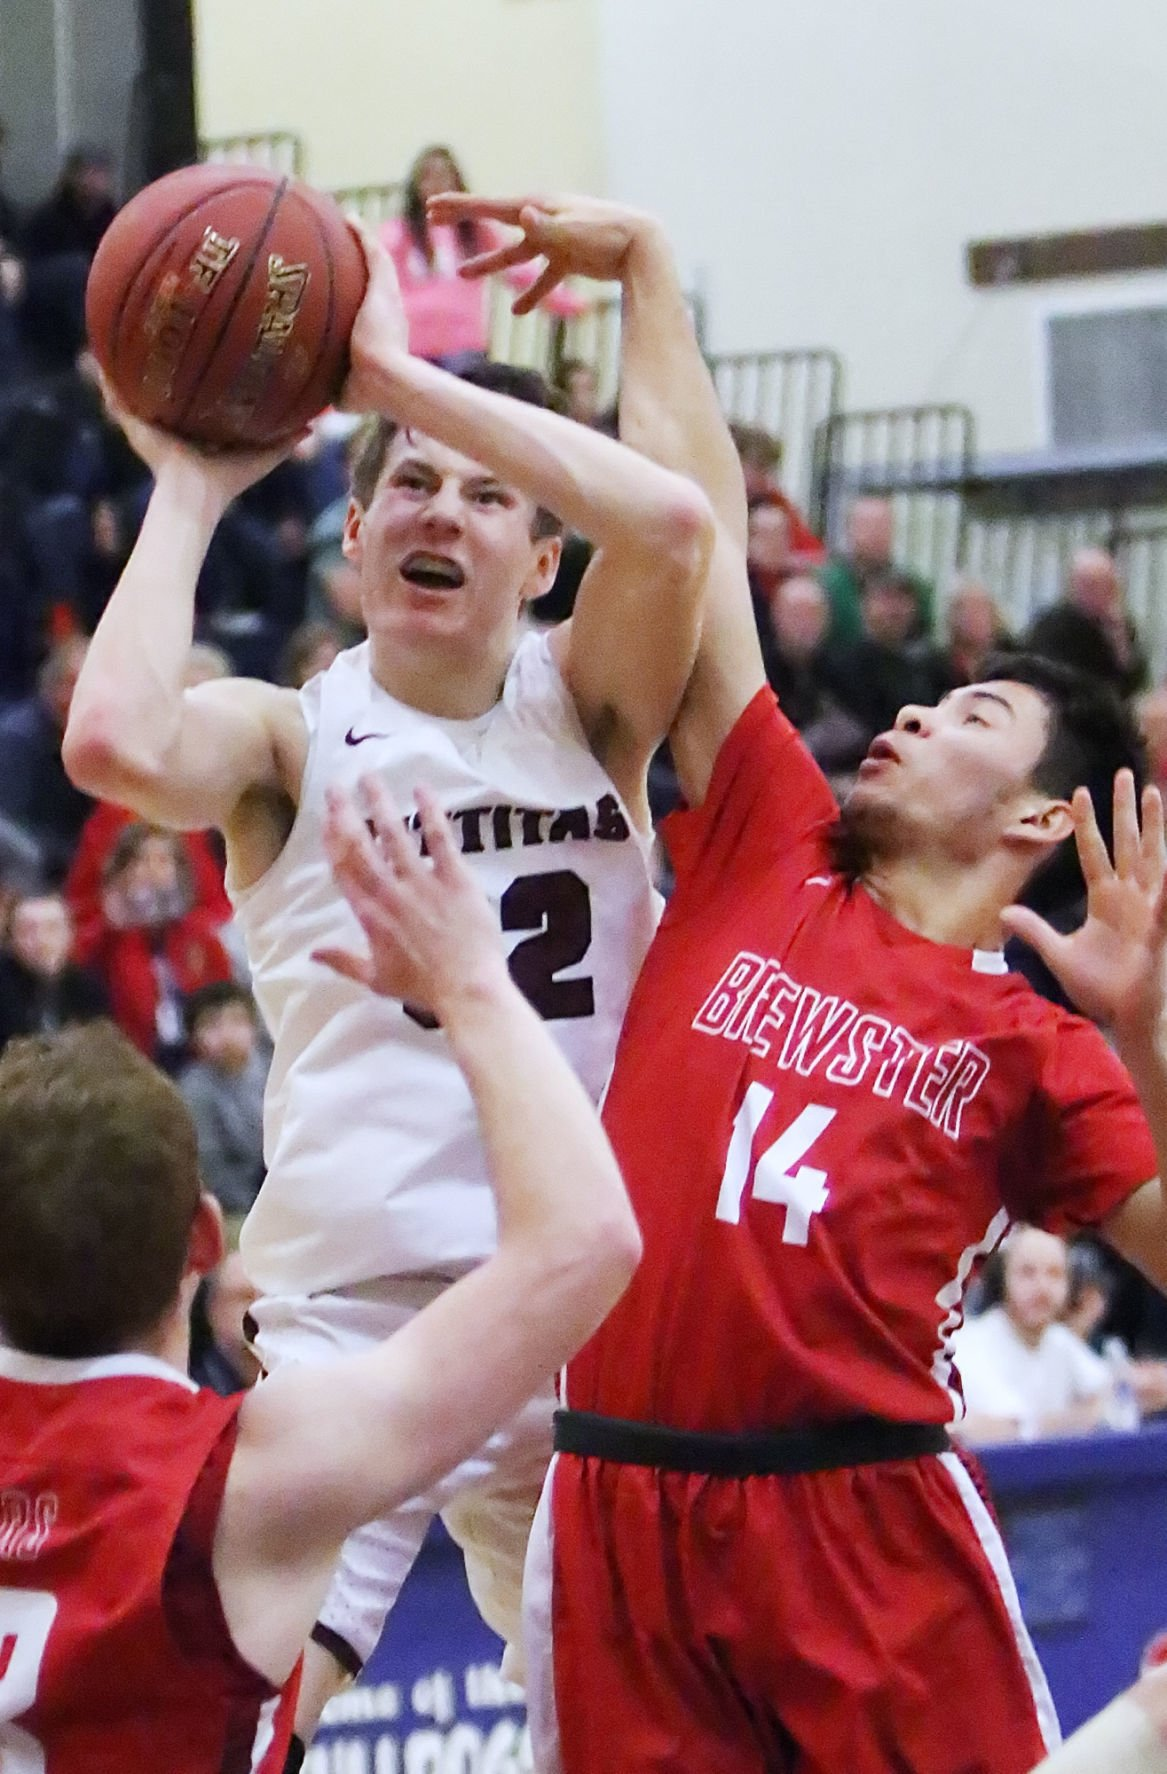 Kittitas boys basketball takes down Brewster in Regional